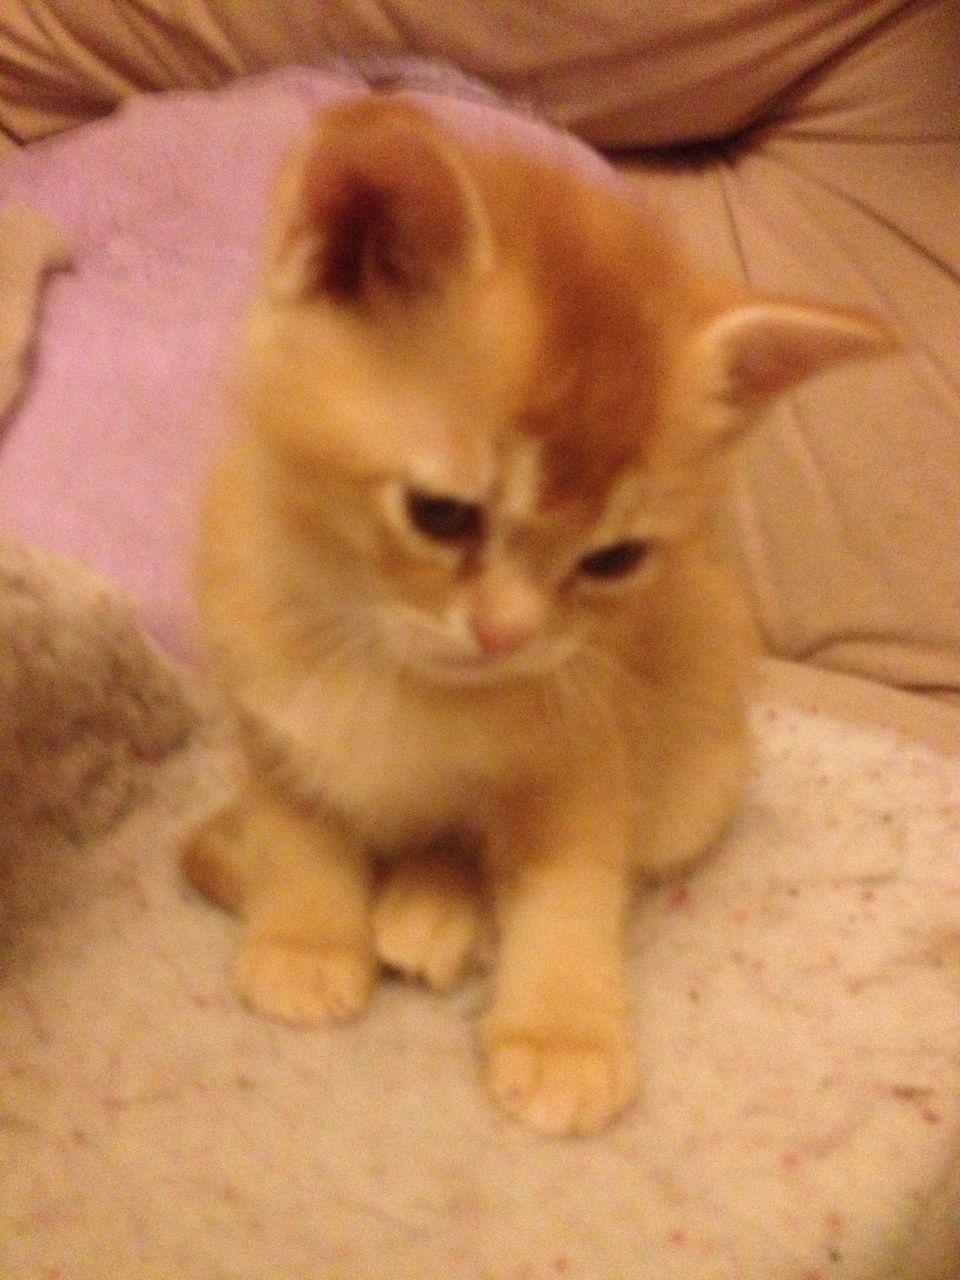 Asian Kitten: Asian Beautiful Full Expression Red Asian Kitten Bristol Breed